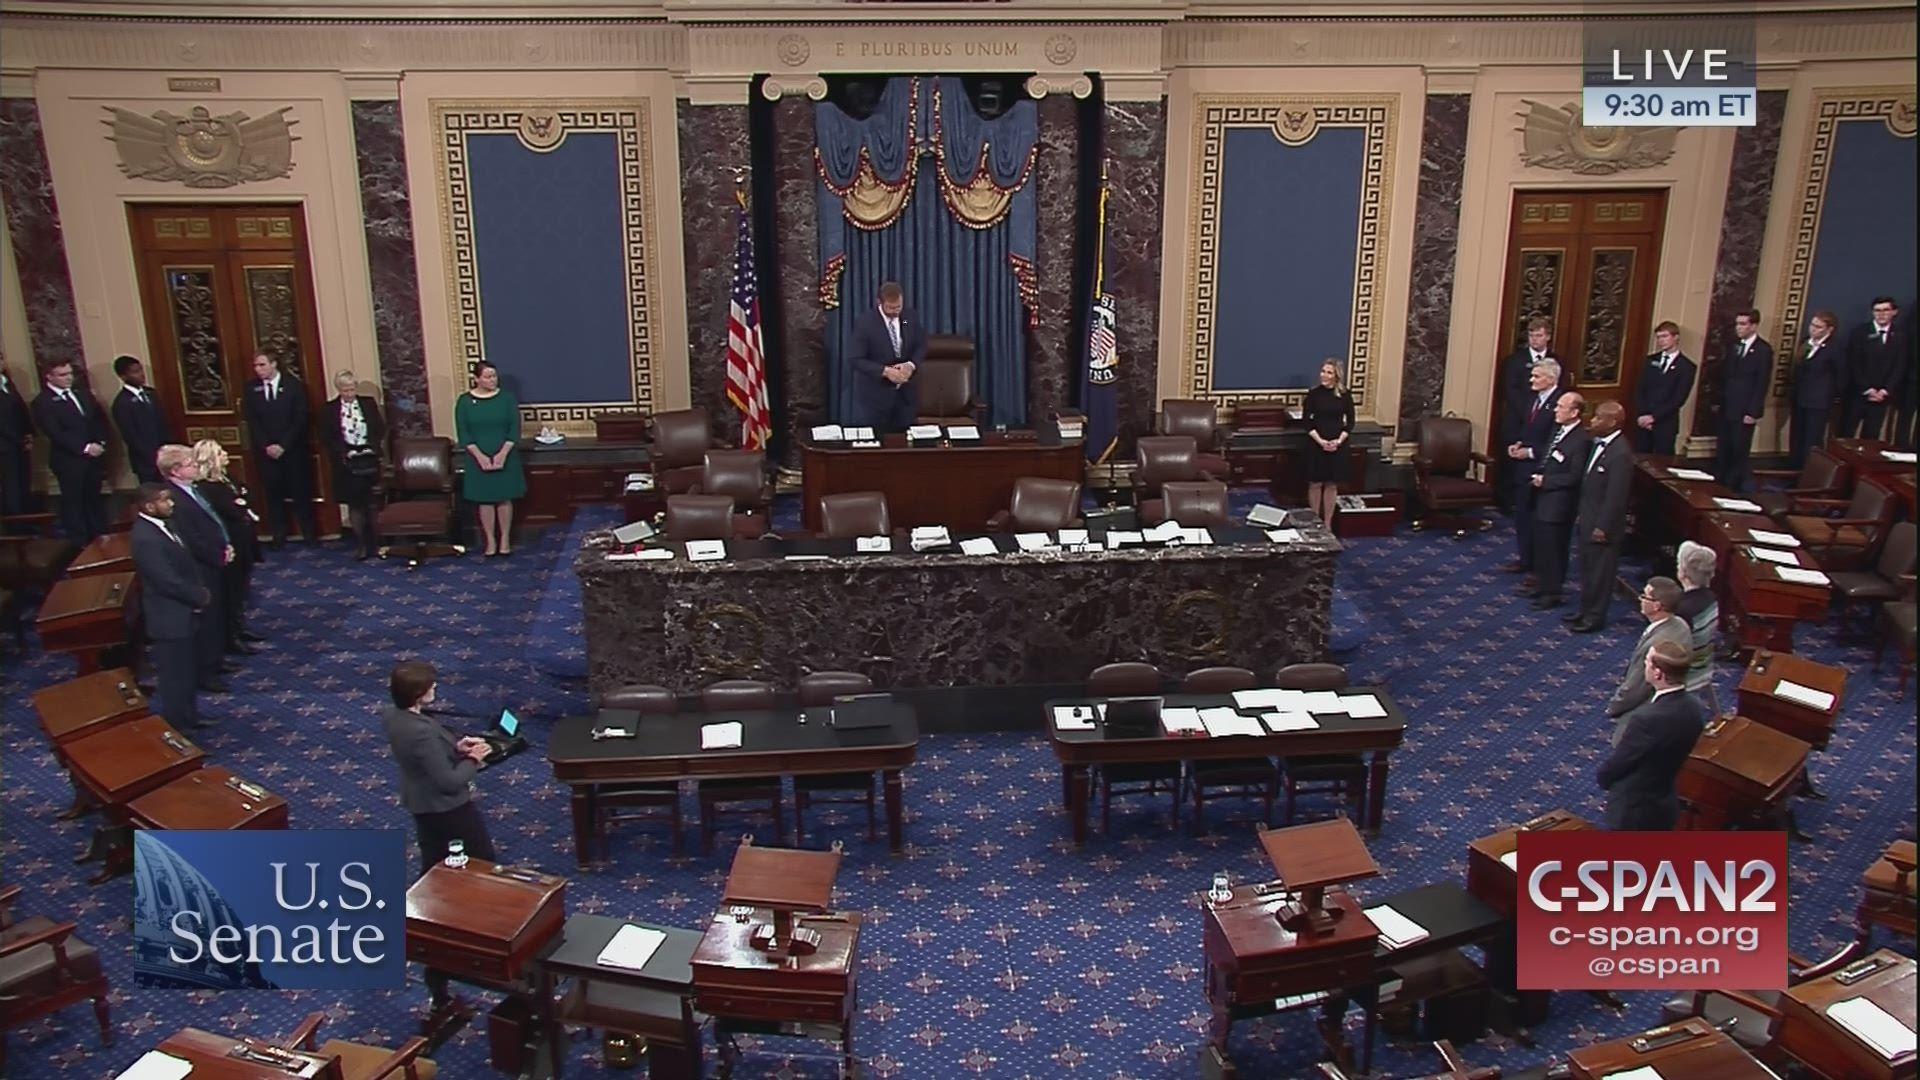 4b85cf532ed Senate Session | C-SPAN.org